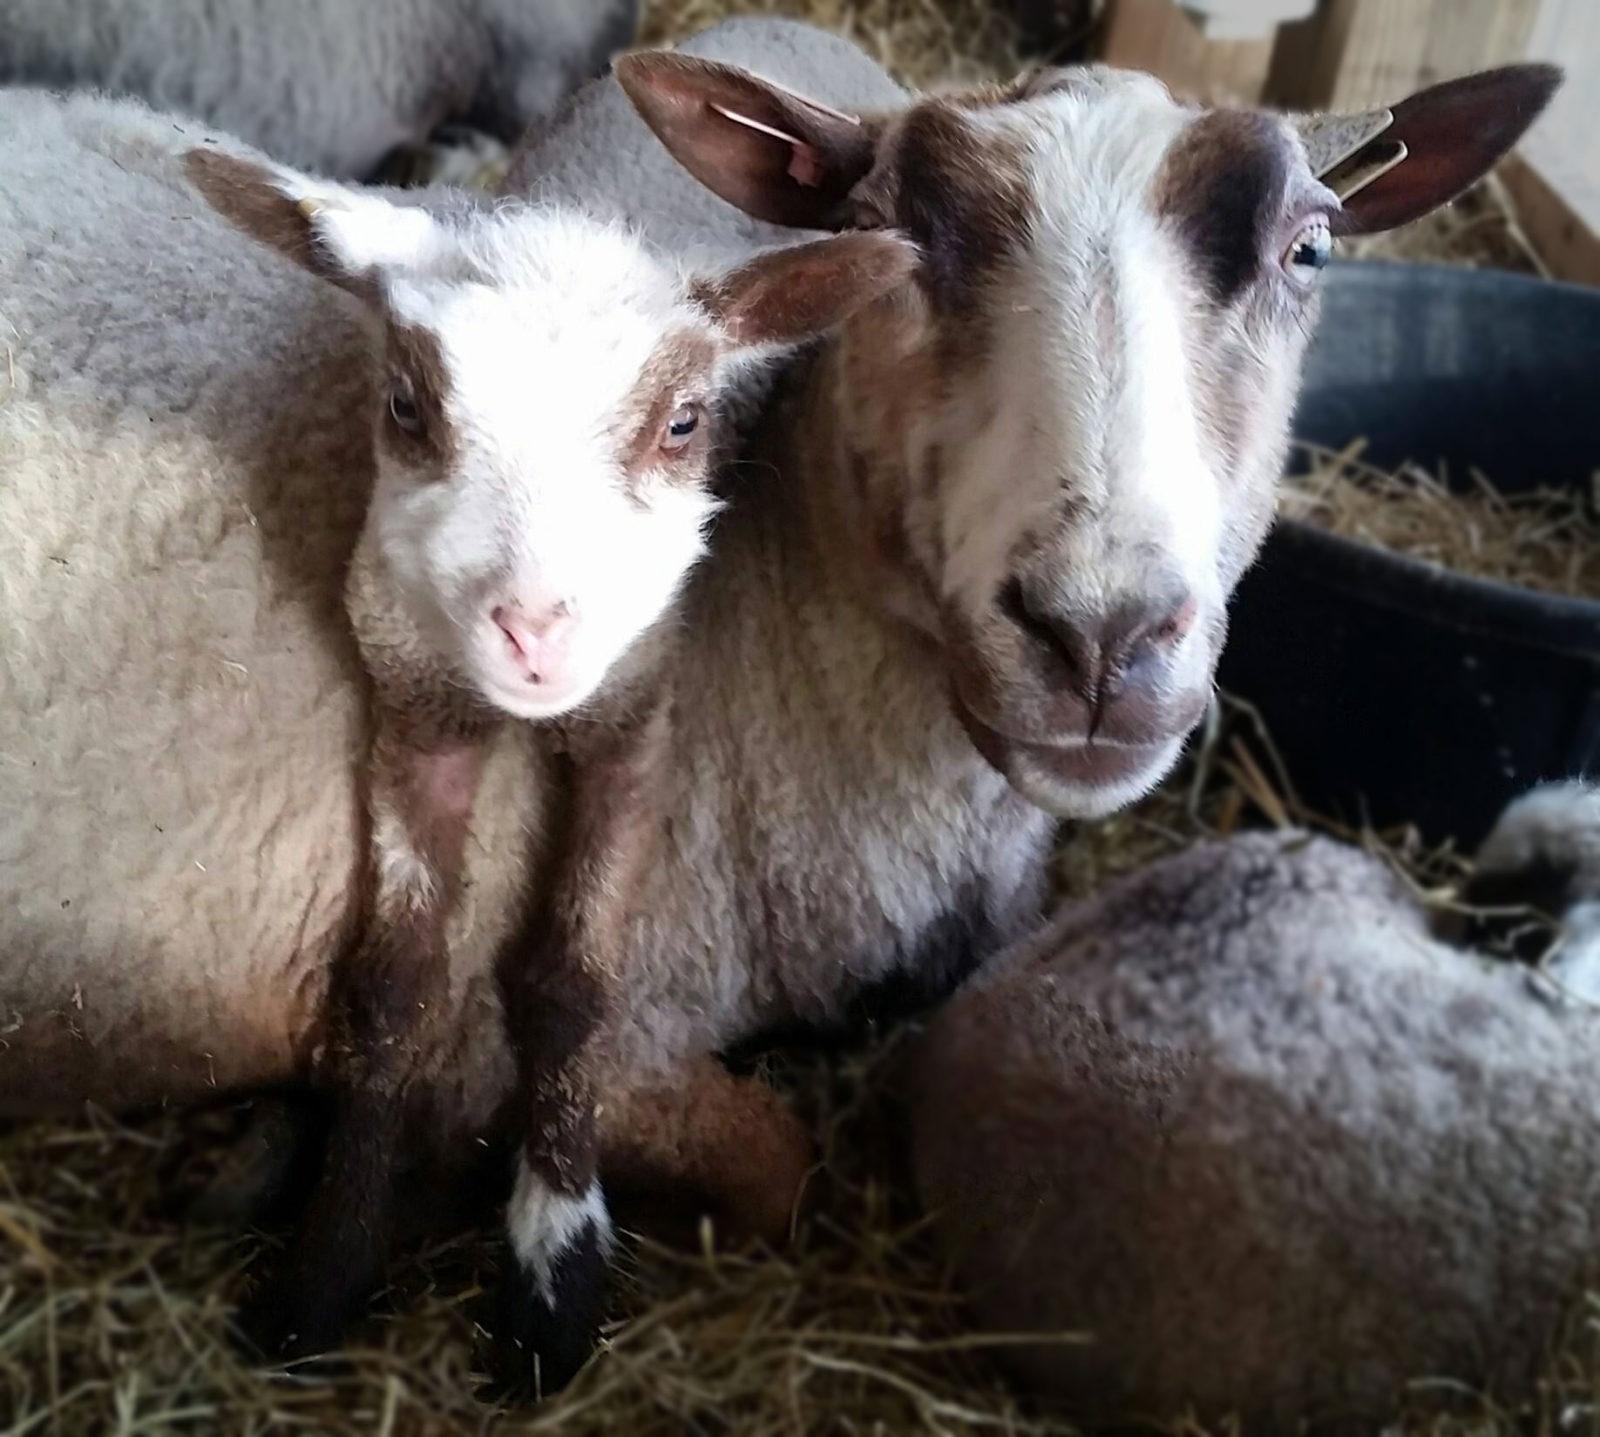 Mom and baby lamb